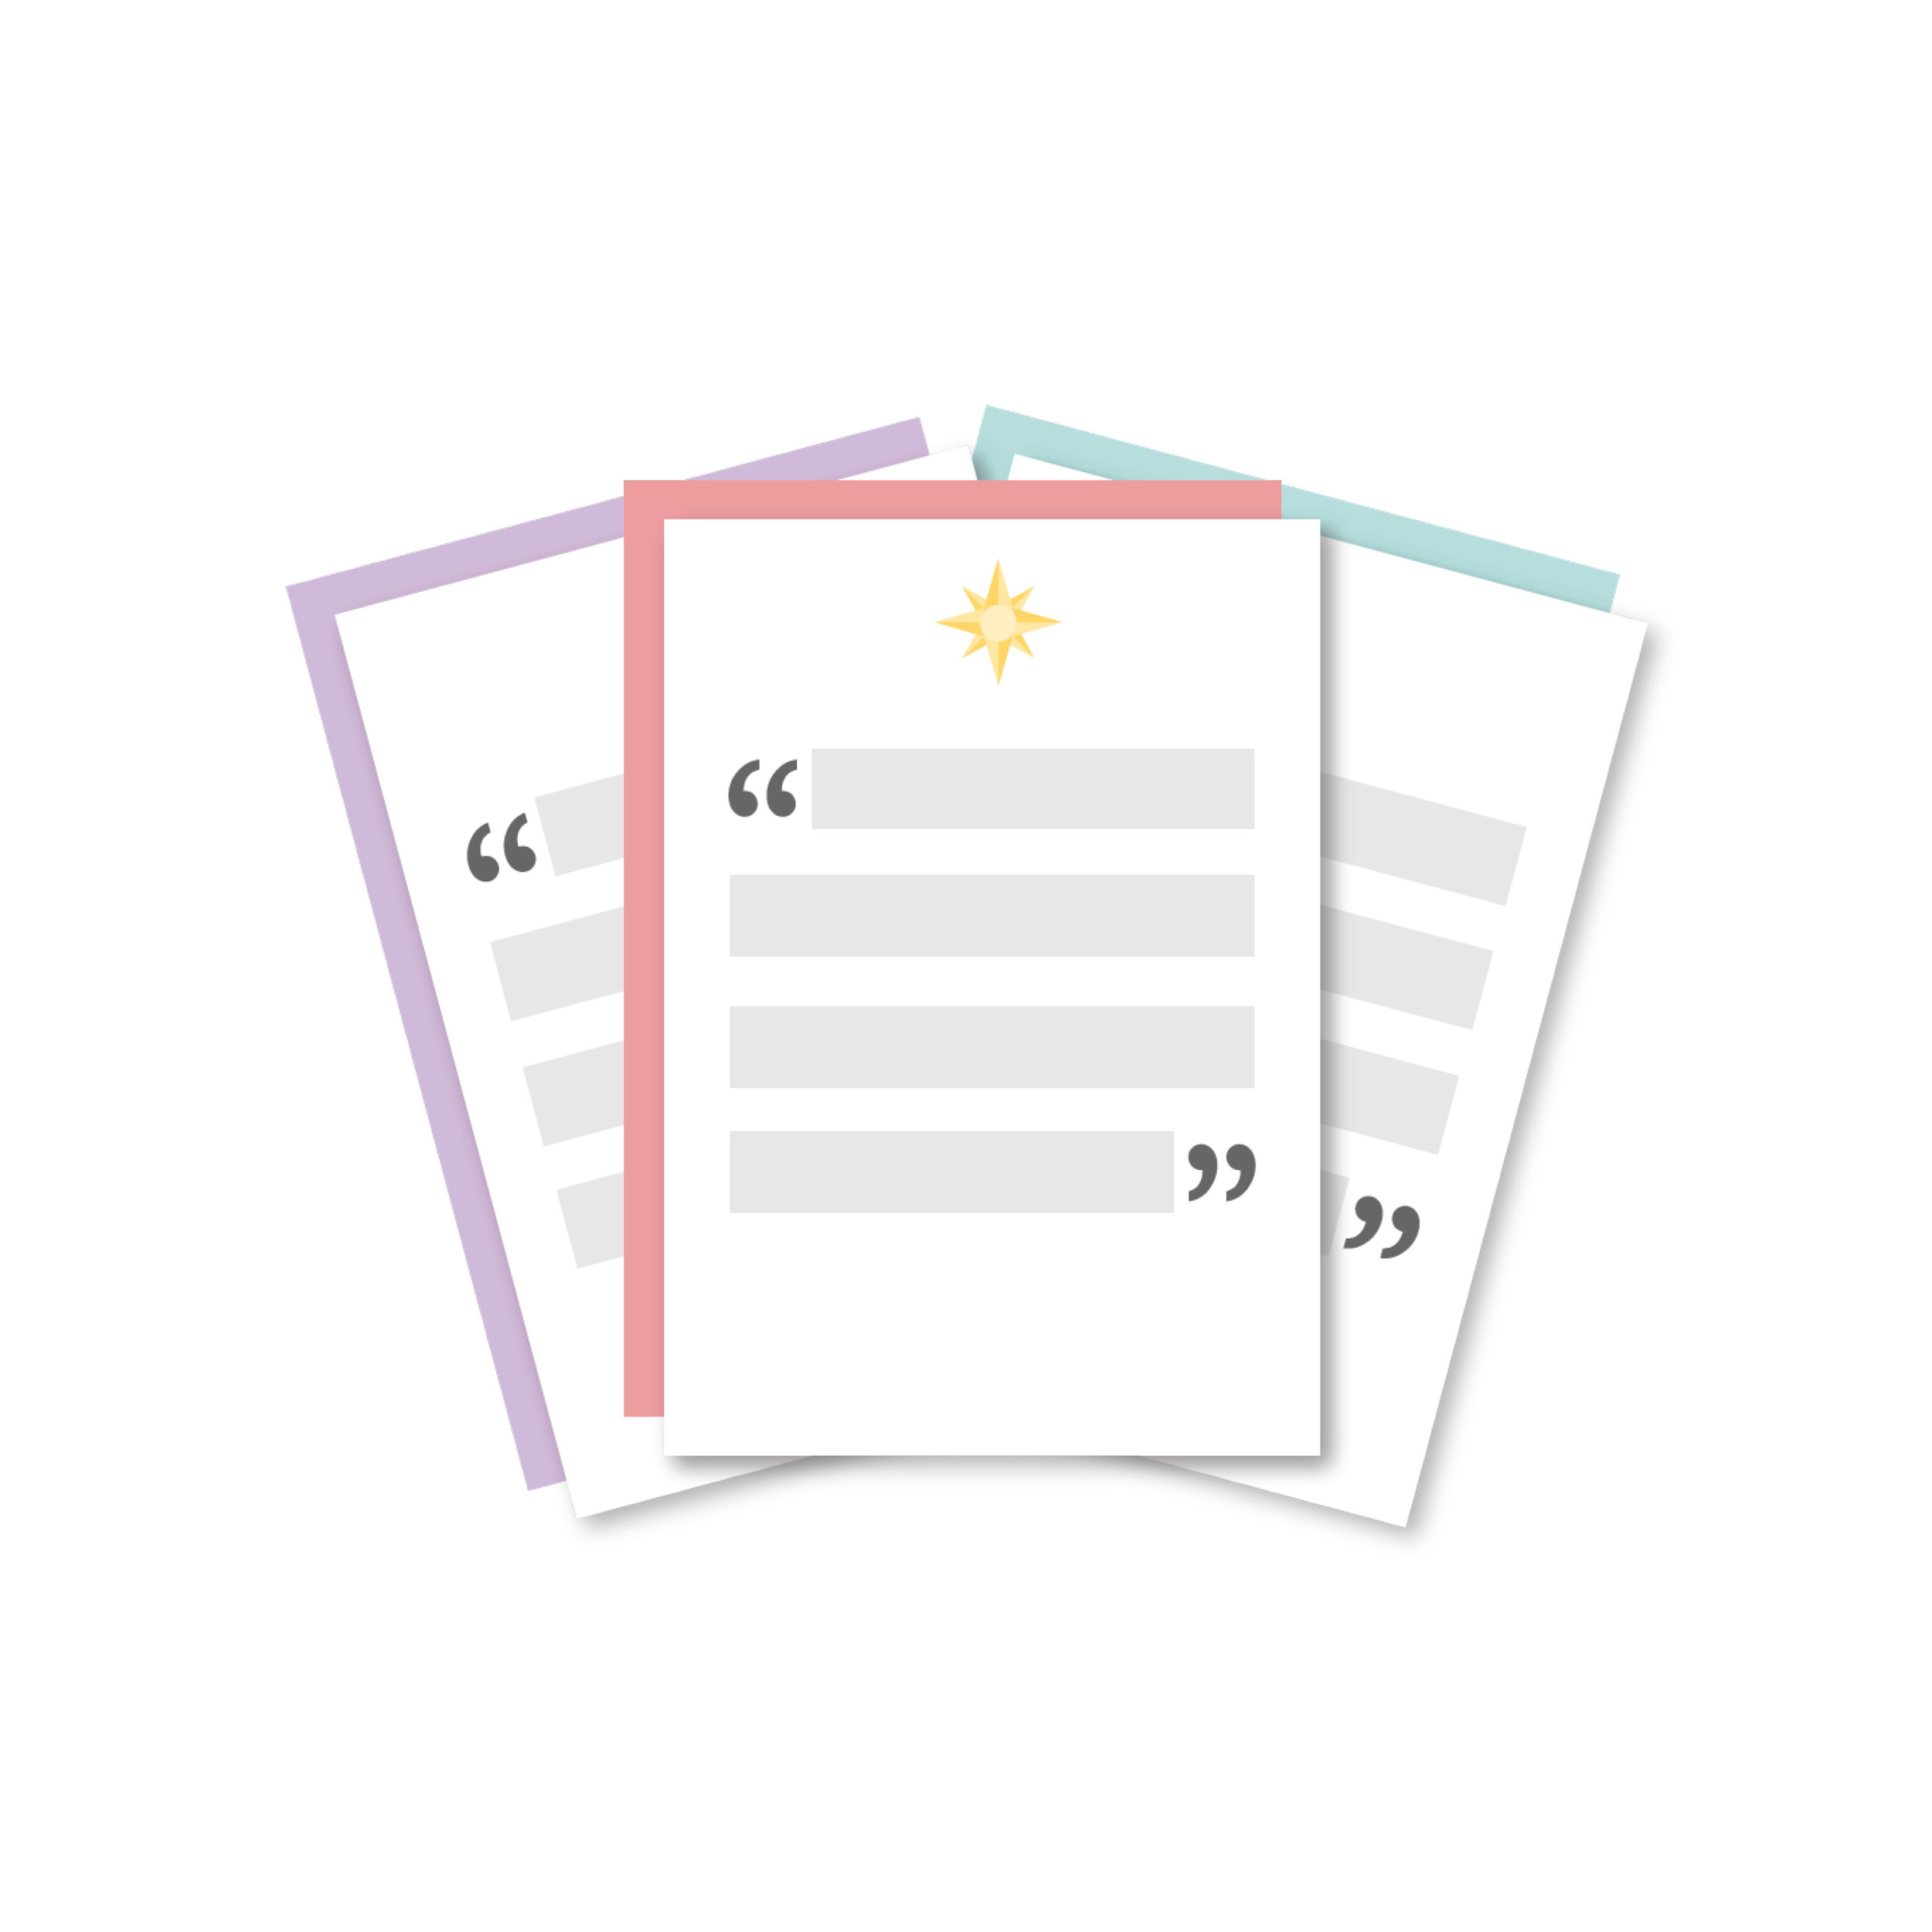 Free InDesign Course - Additional Resources   viaYuri.com